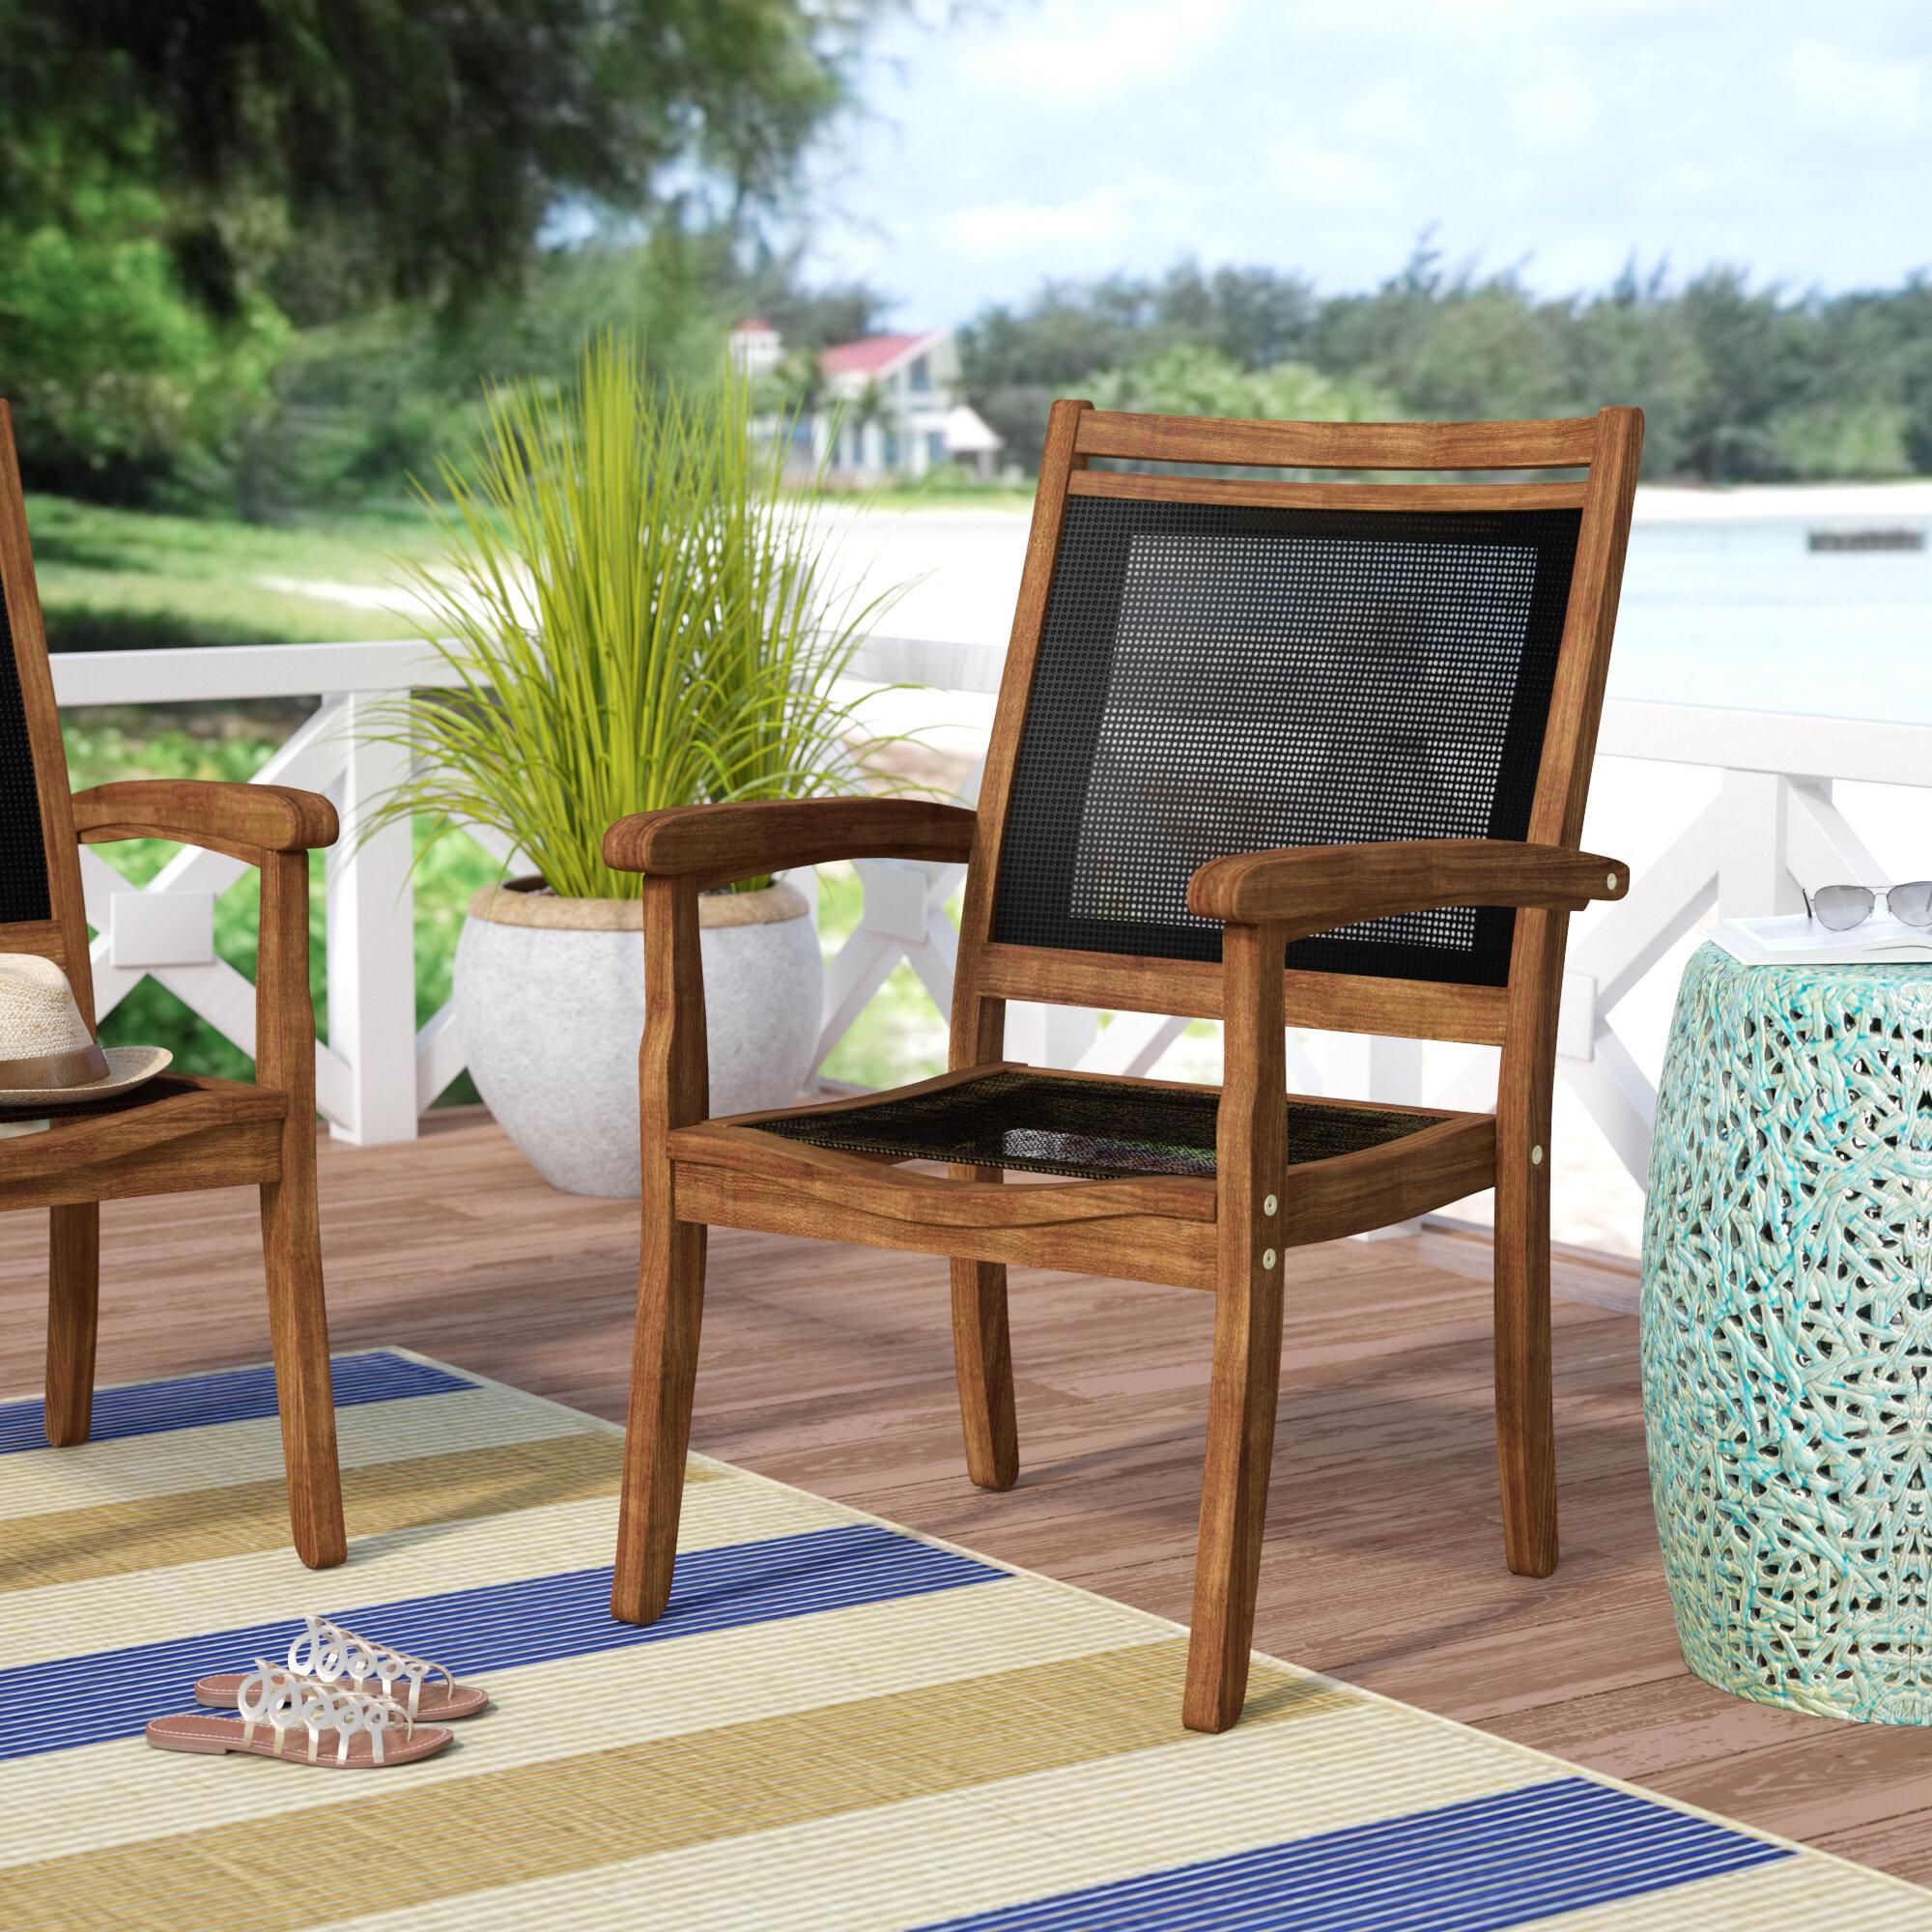 Prime Tovar Sling And Eucalyptus Patio Chair Camellatalisay Diy Chair Ideas Camellatalisaycom